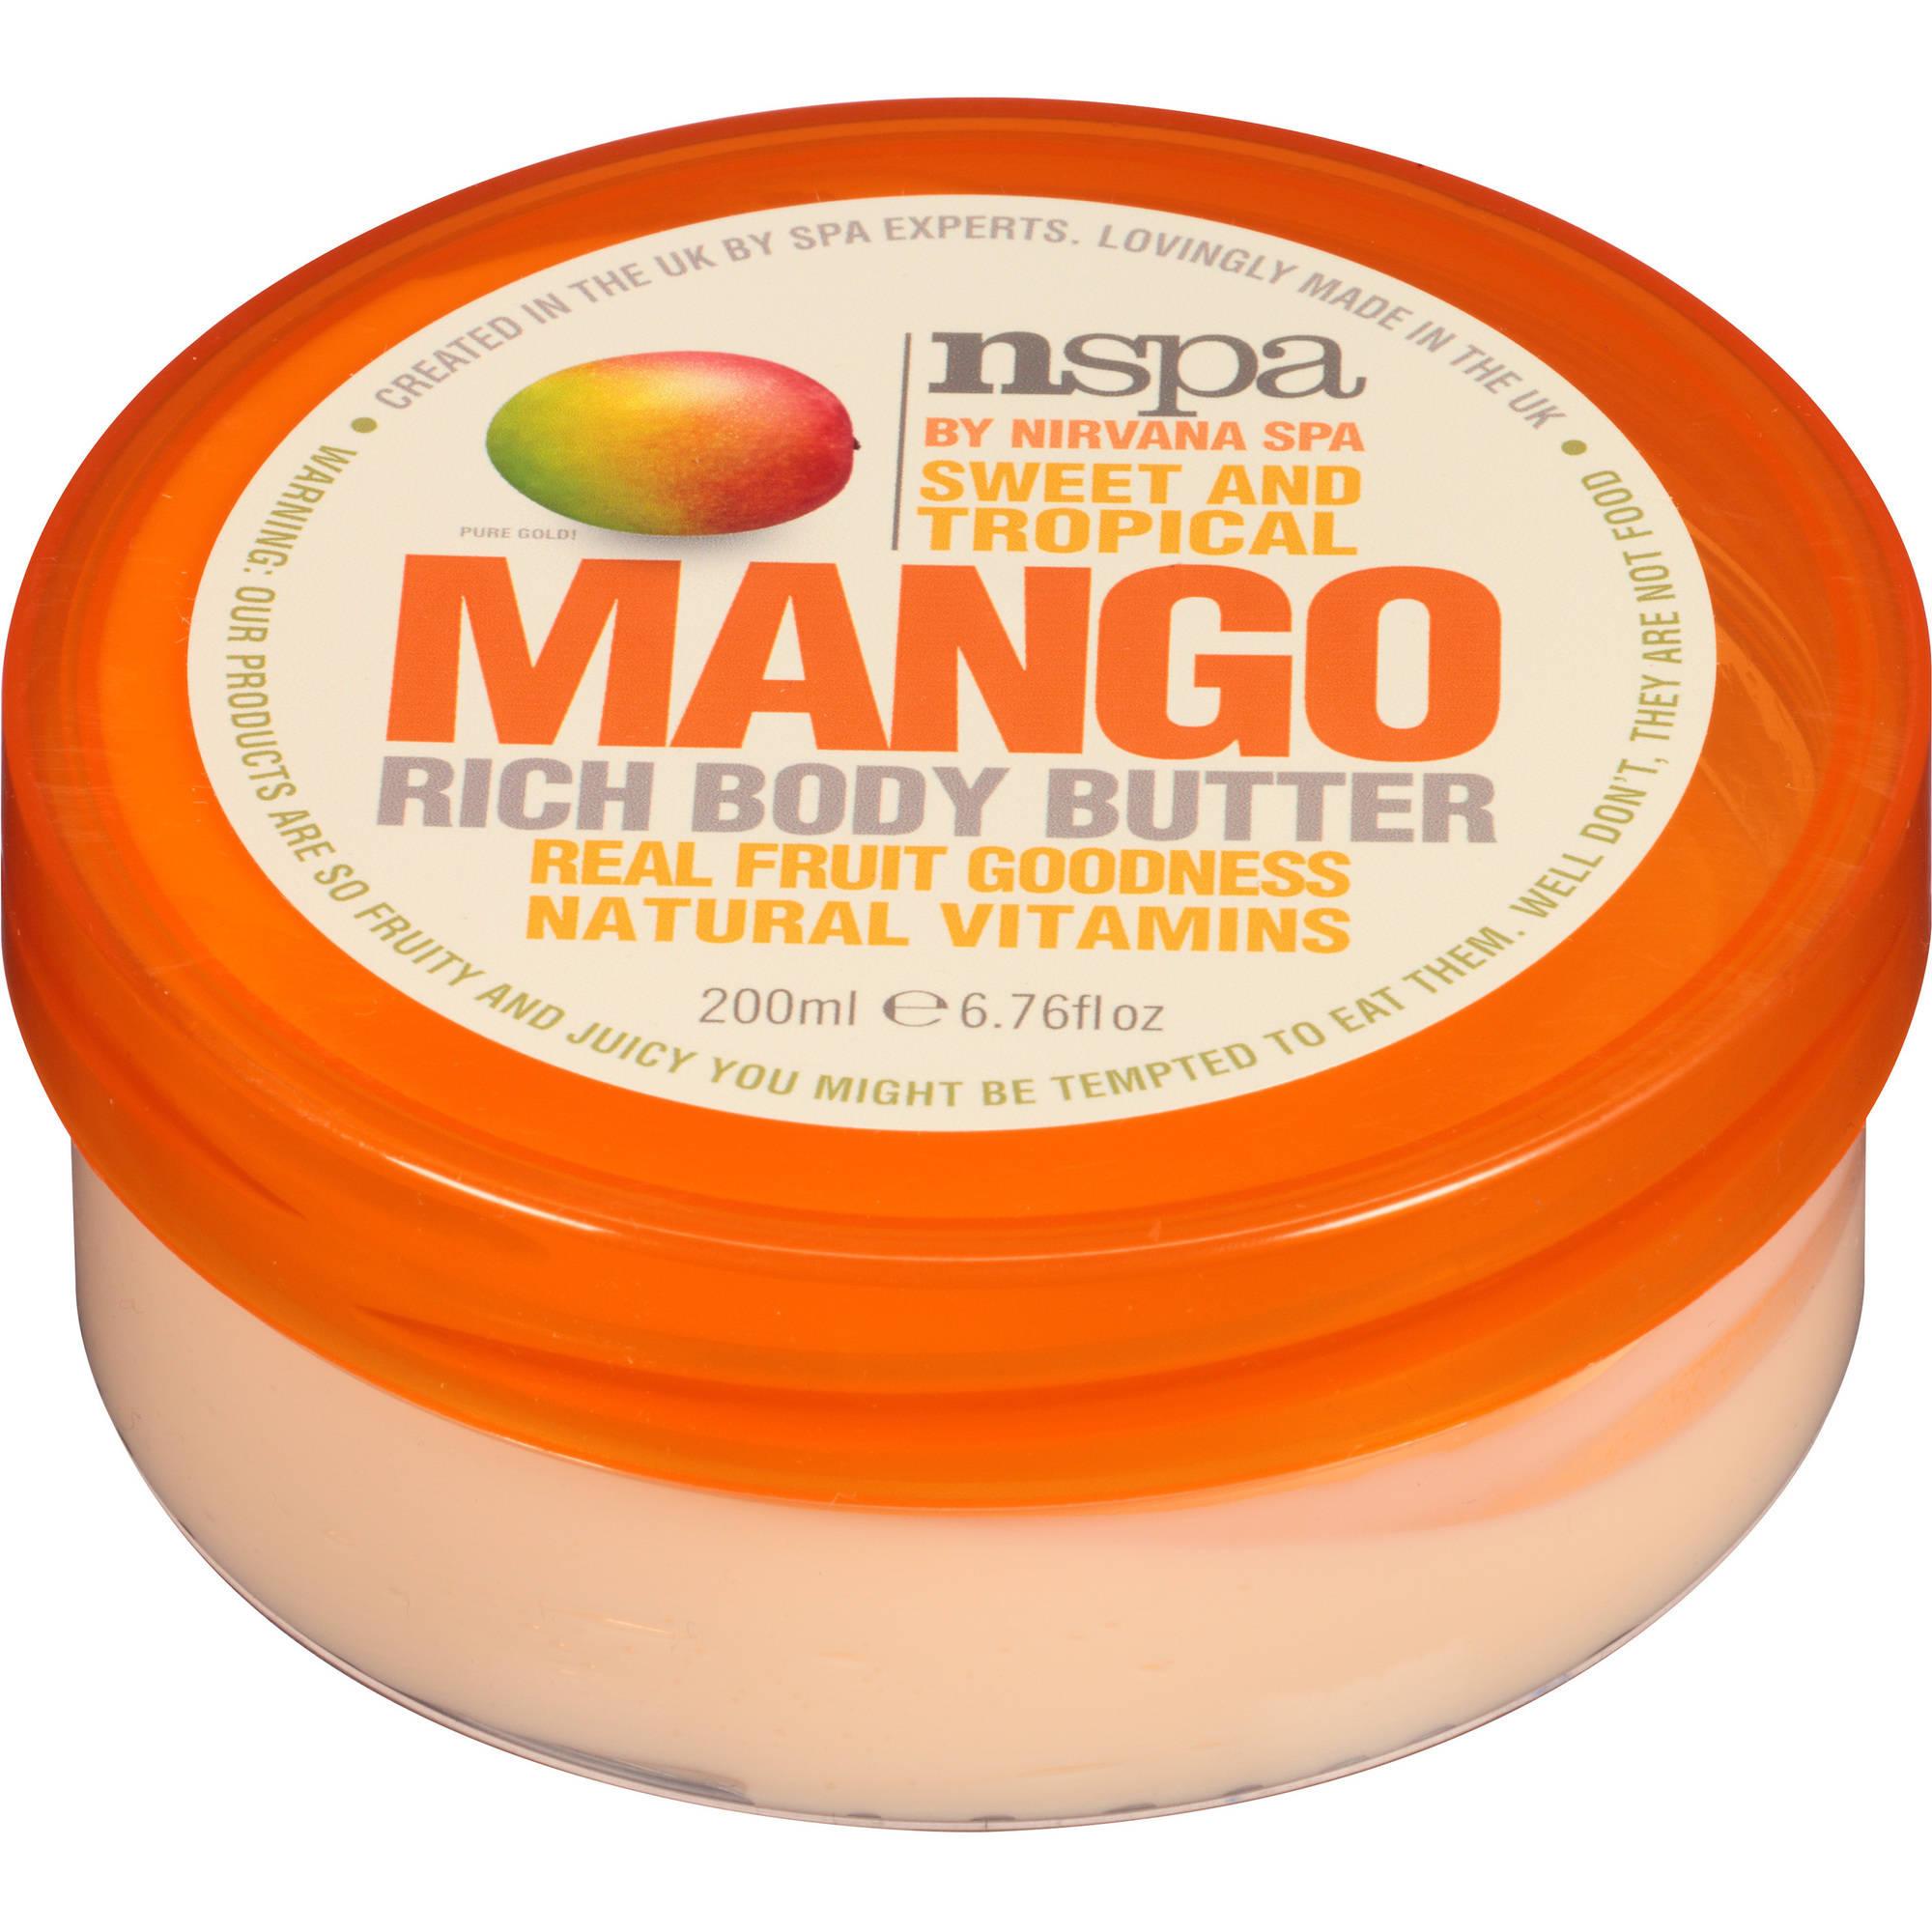 NSPA Sweet and Tropical Mango Rich Body Butter, 6.76 fl oz